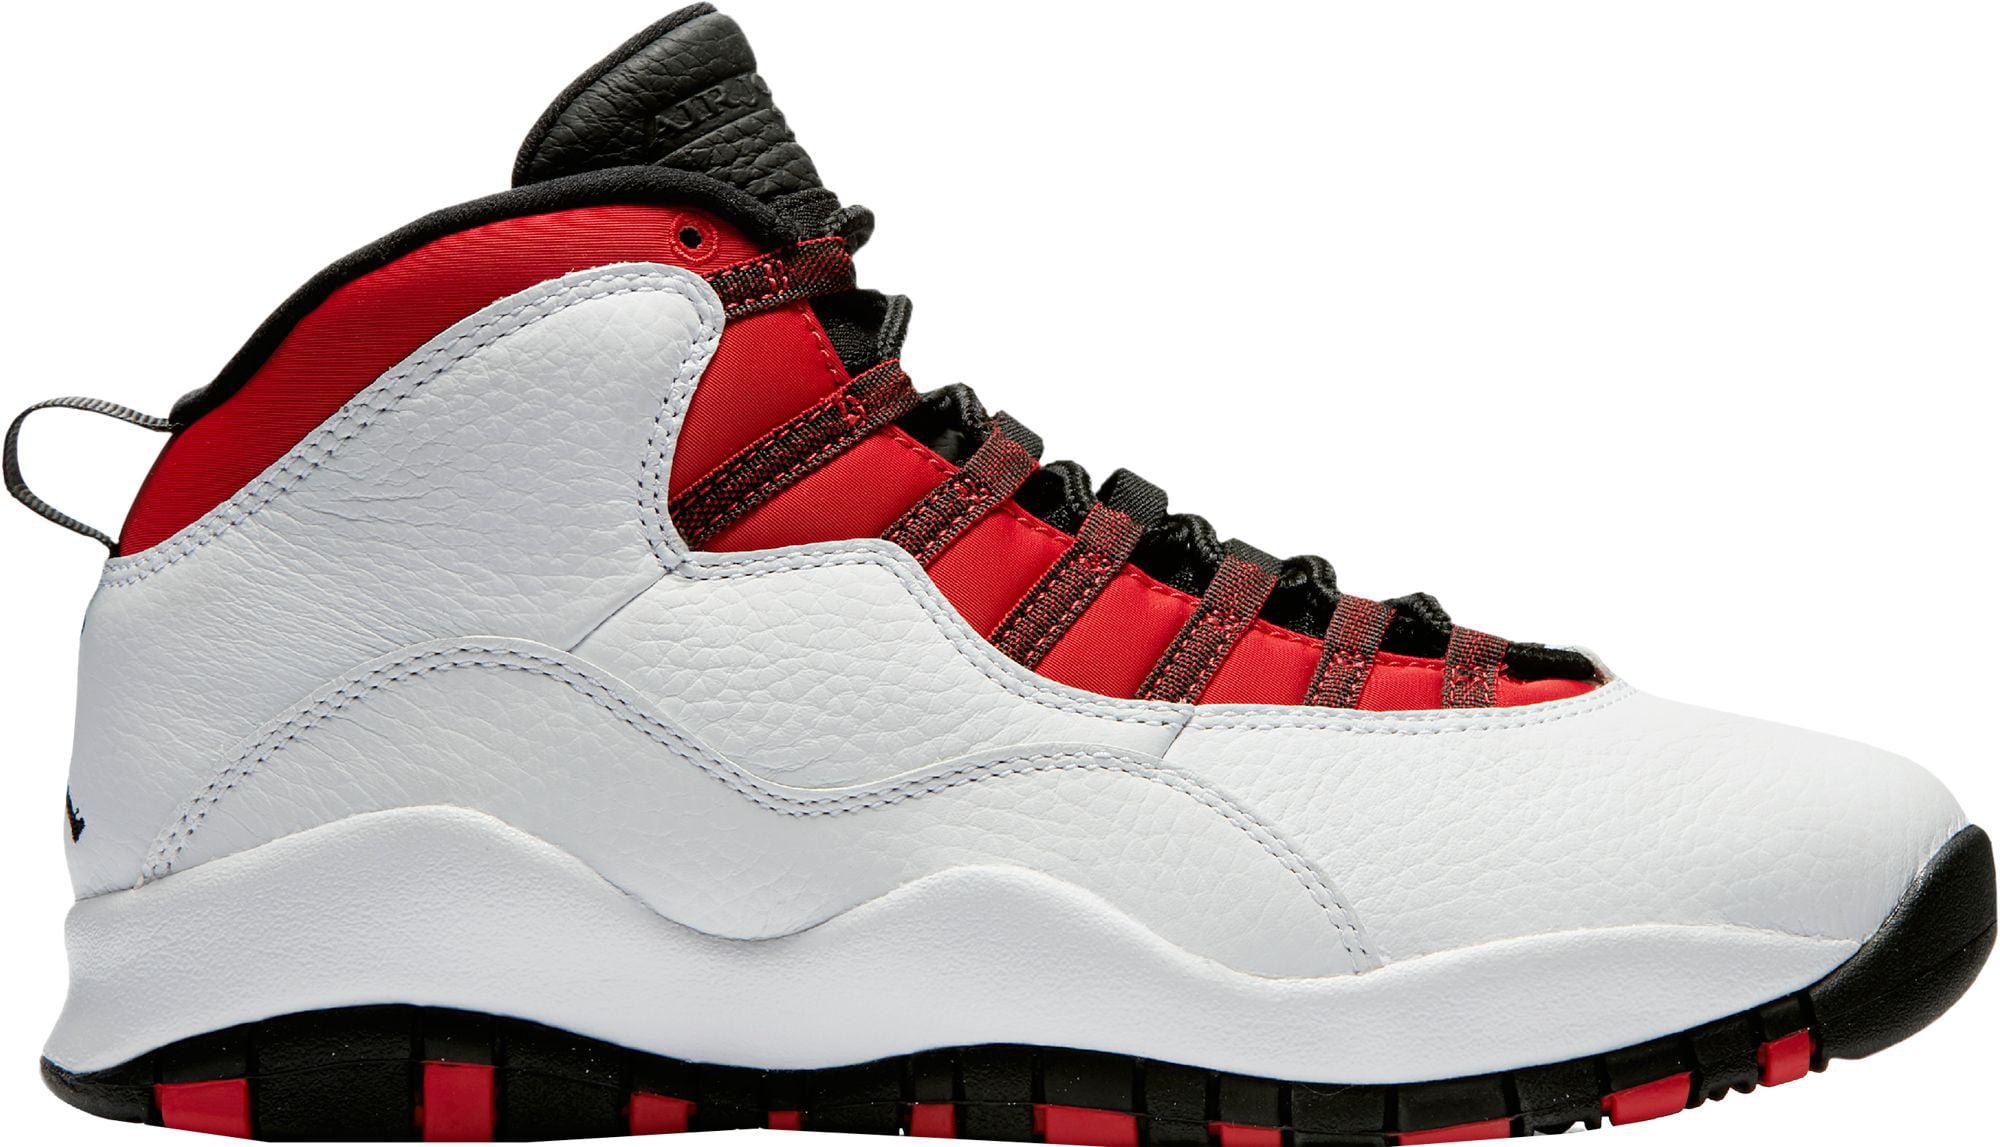 Jordan Men's Air Jordan 10 Retro